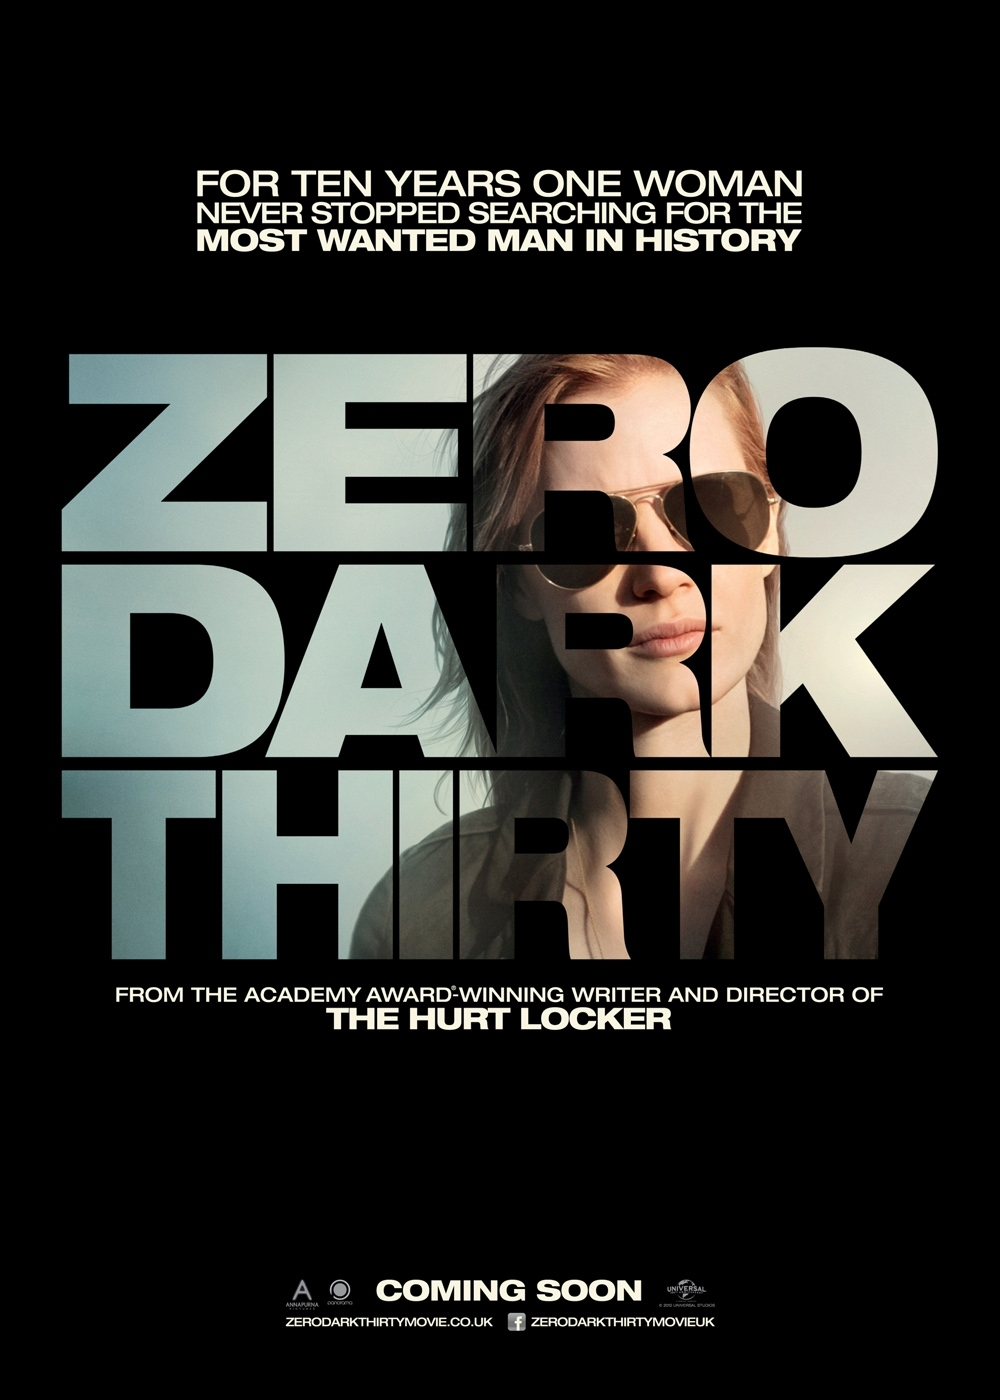 Zero Dark Thirty - Movie Poster #2 (Original)